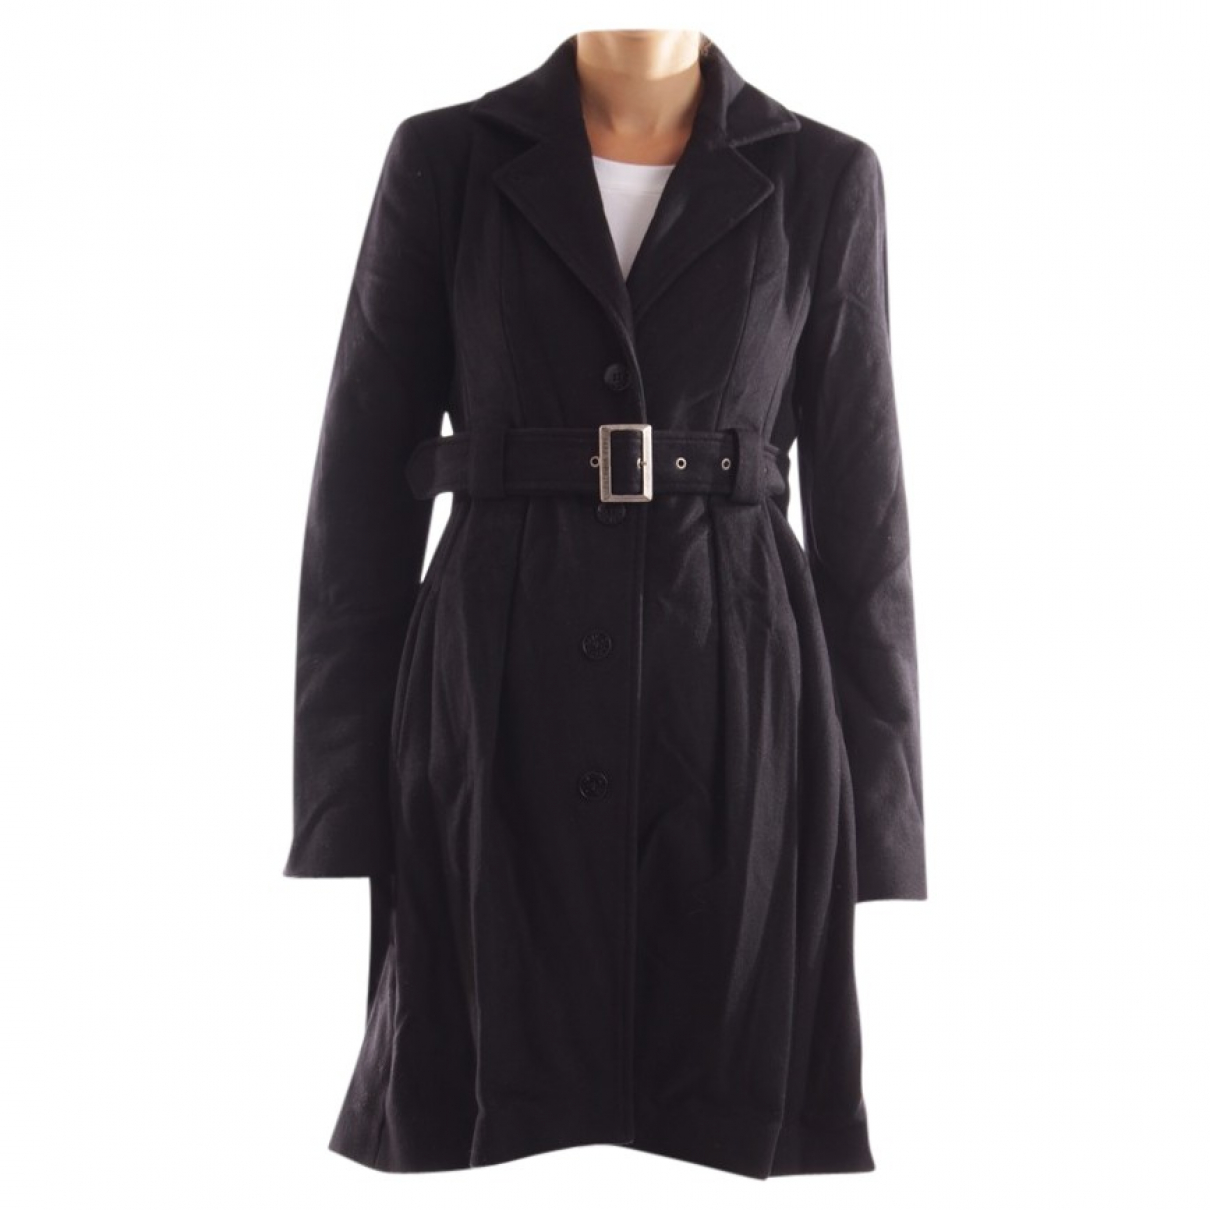 Patrizia Pepe \N Black Linen jacket for Women 38 FR